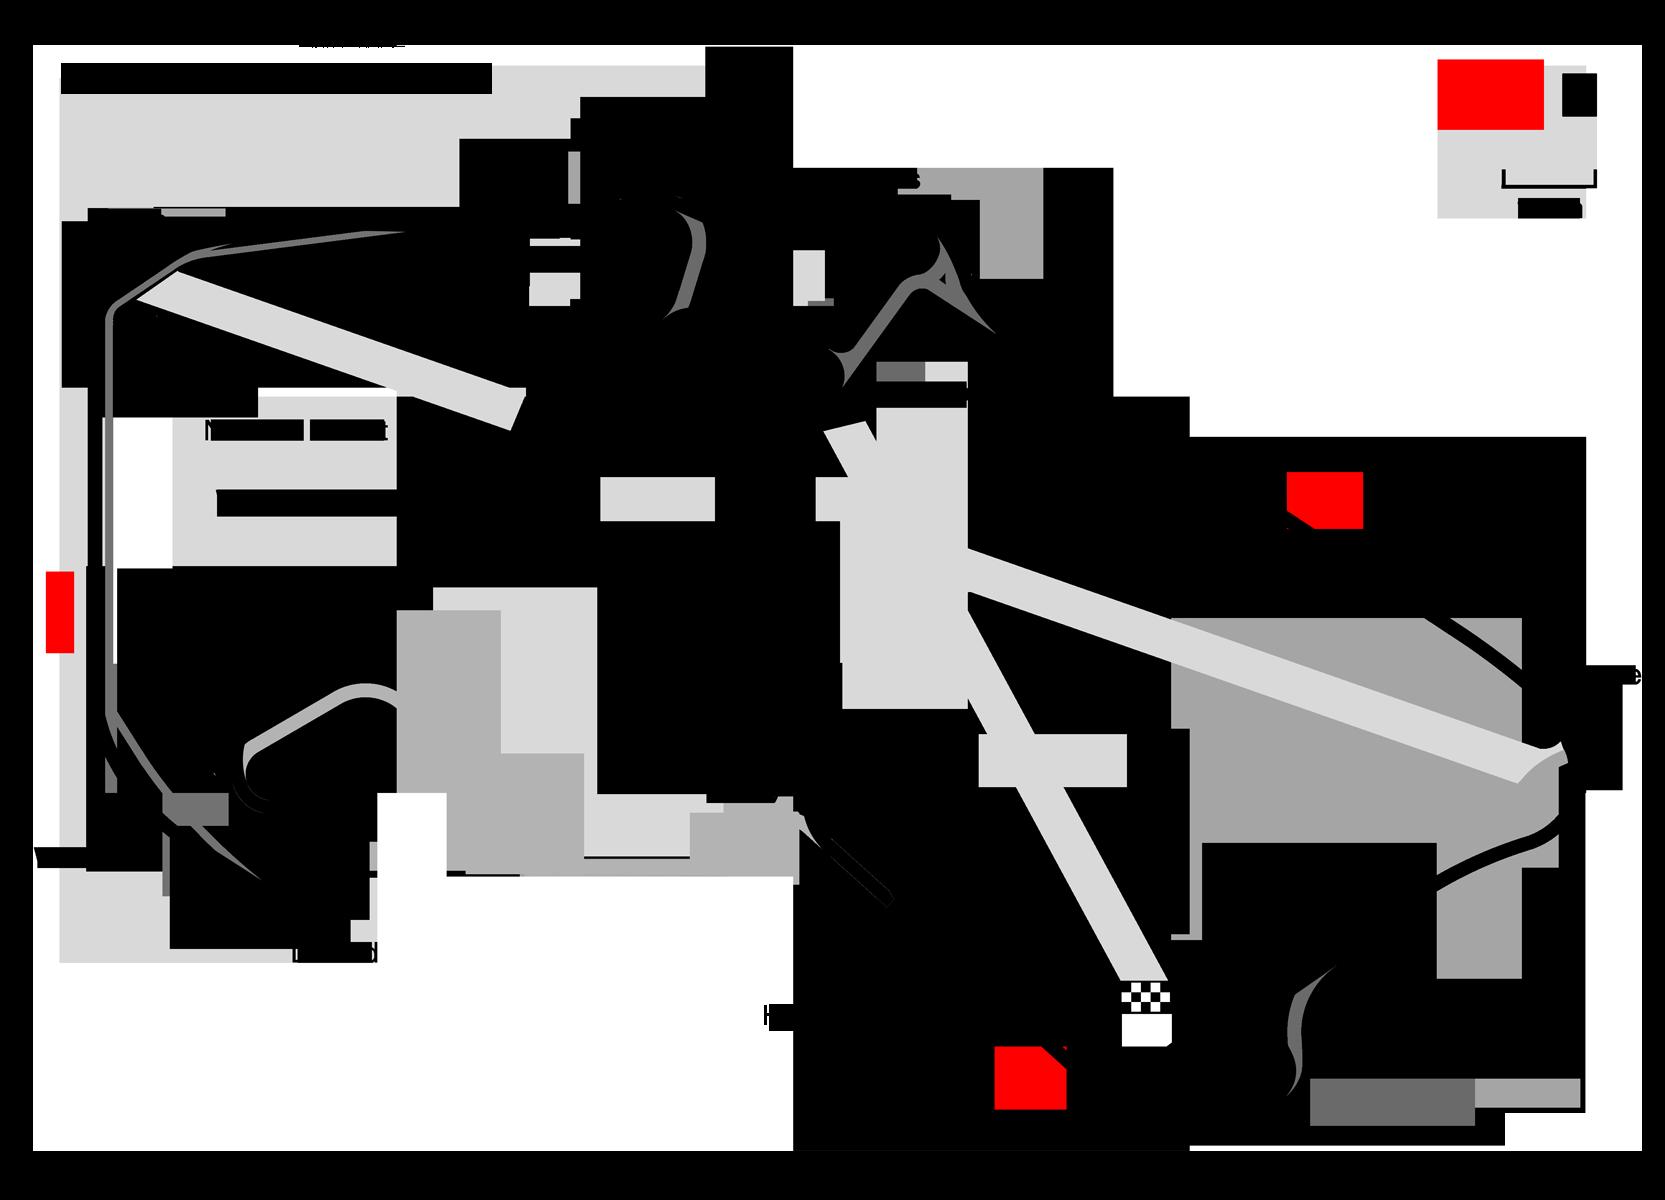 [Image: Silverstone_Circuit_2020.png]